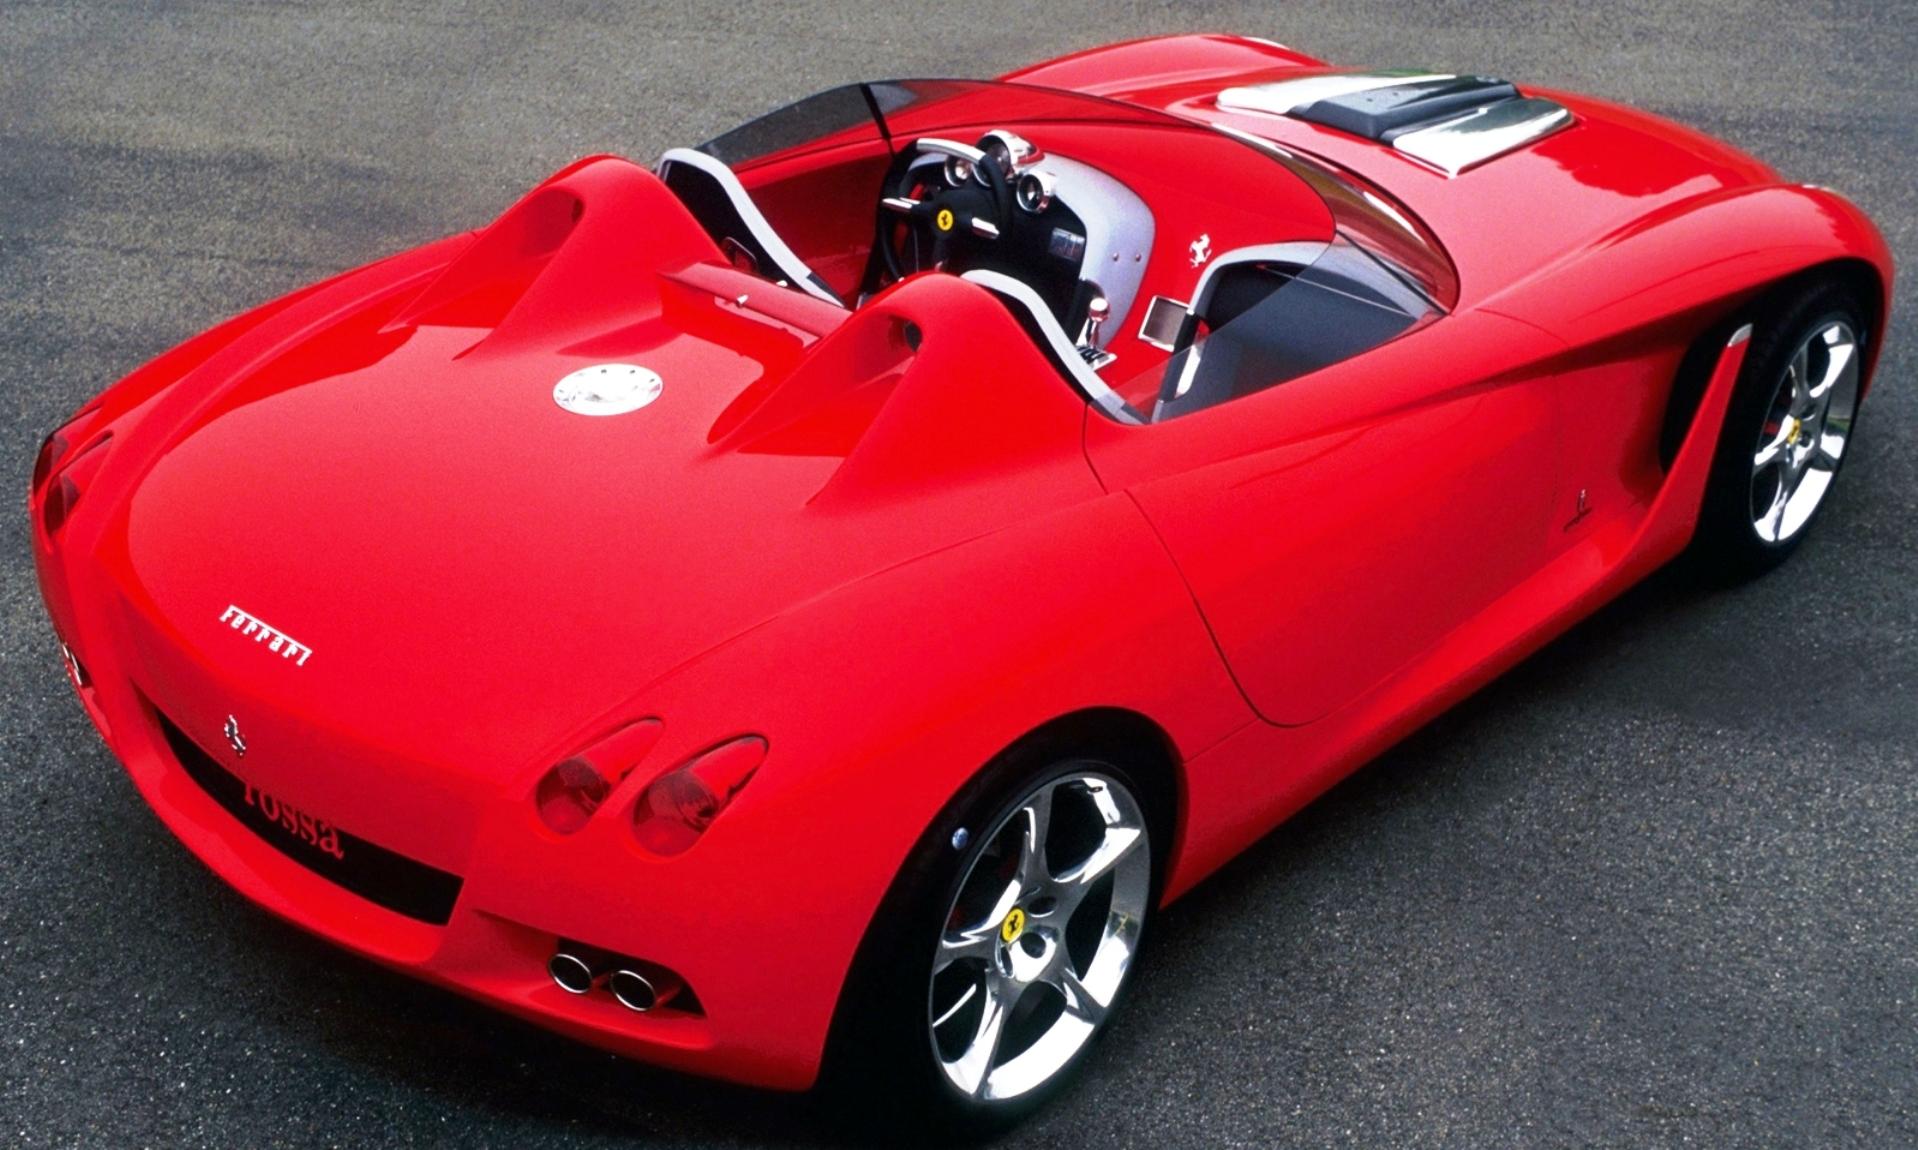 Concept Flashback - 2000 Ferrari Rossa Concept Speedster Influences Corvette, NC2020 and F12 TRS 15